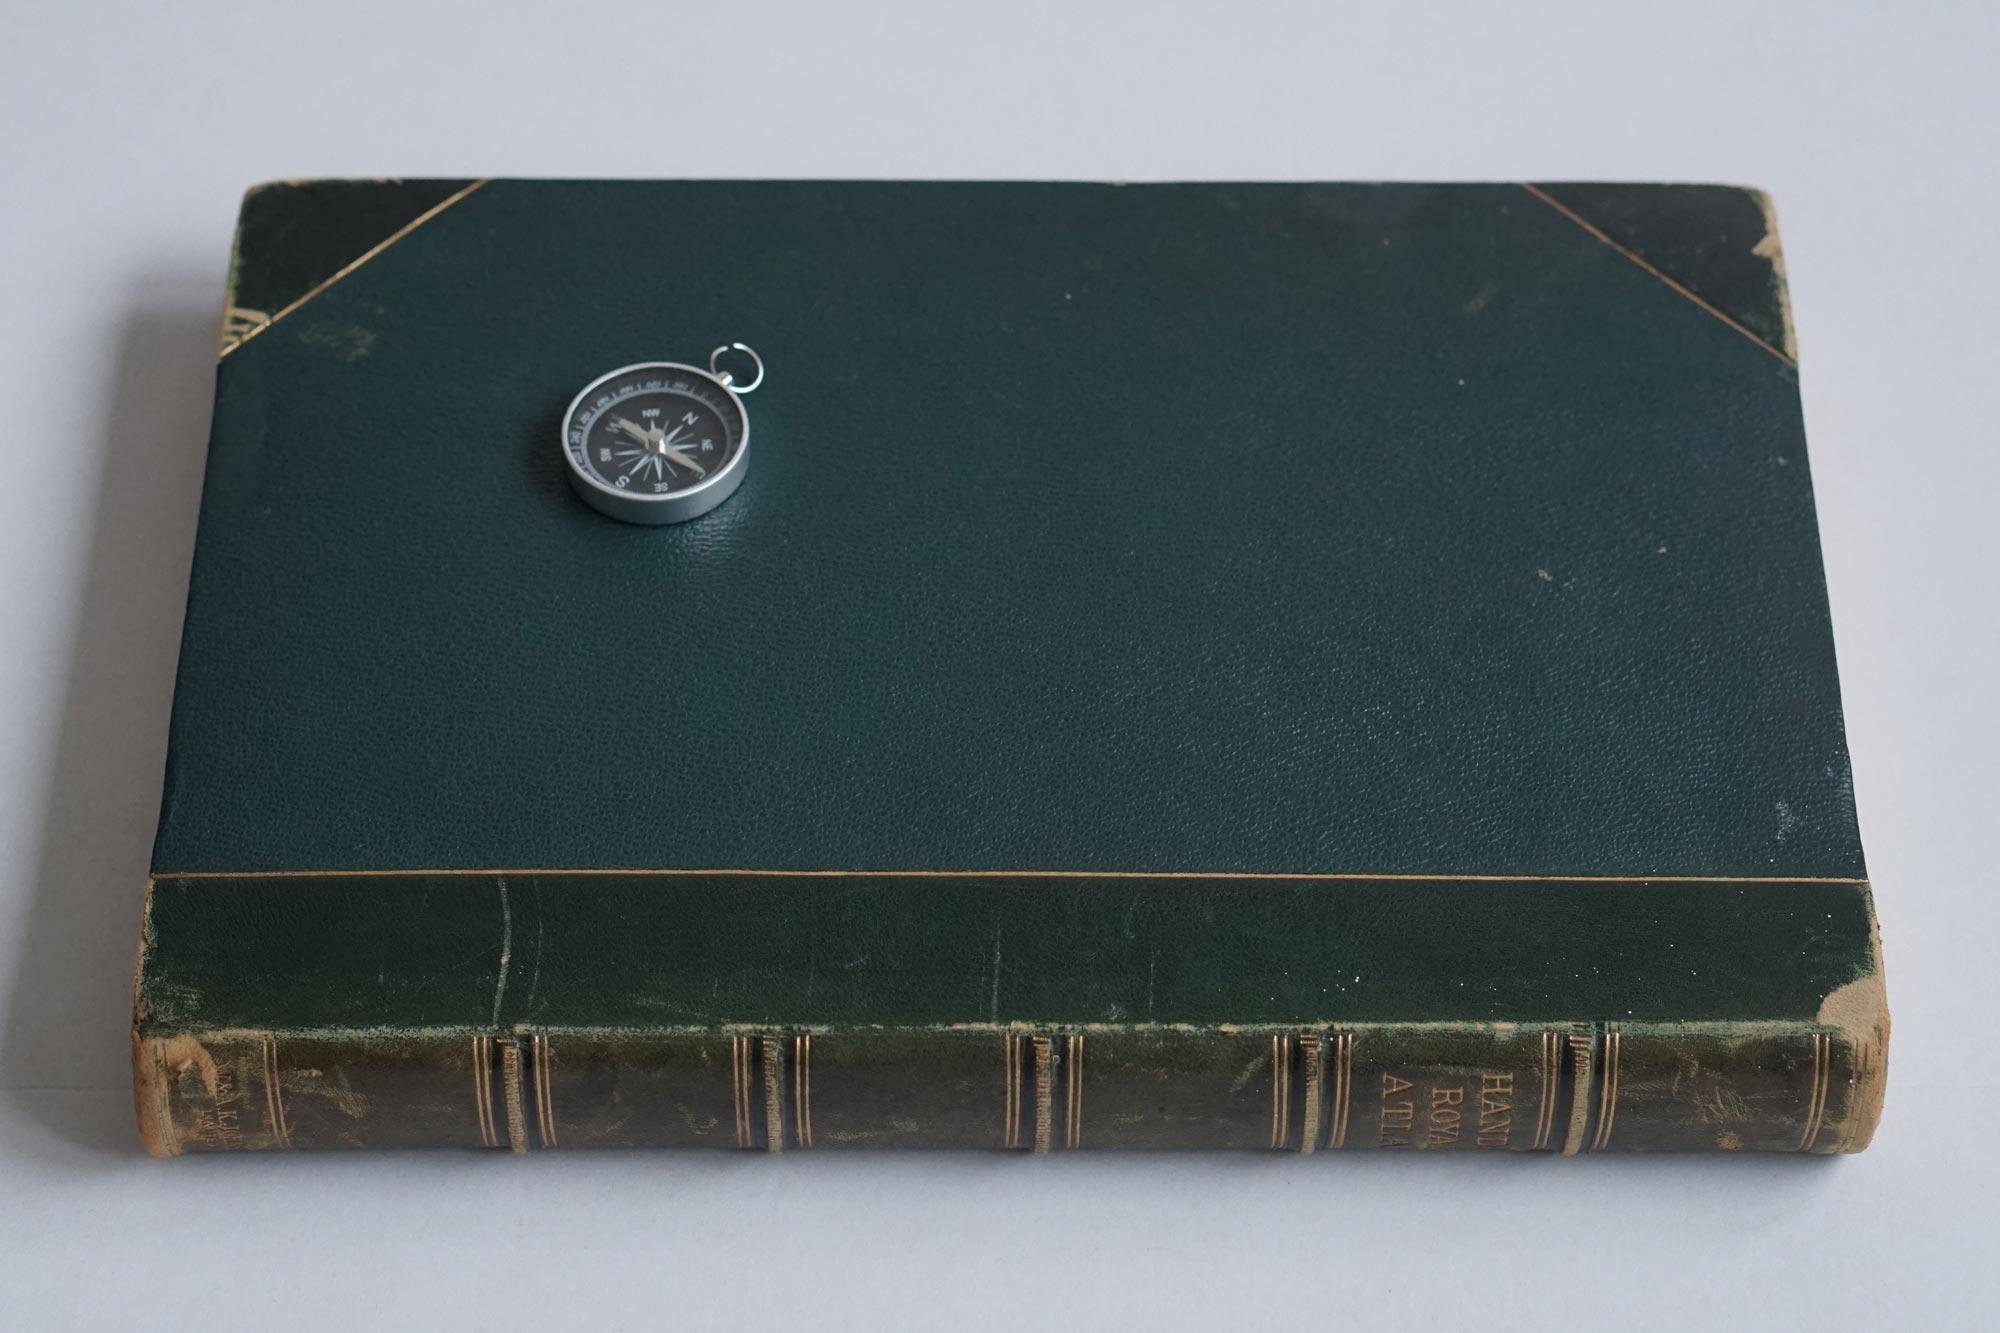 The Handy Royal Atlas of Modern Geography